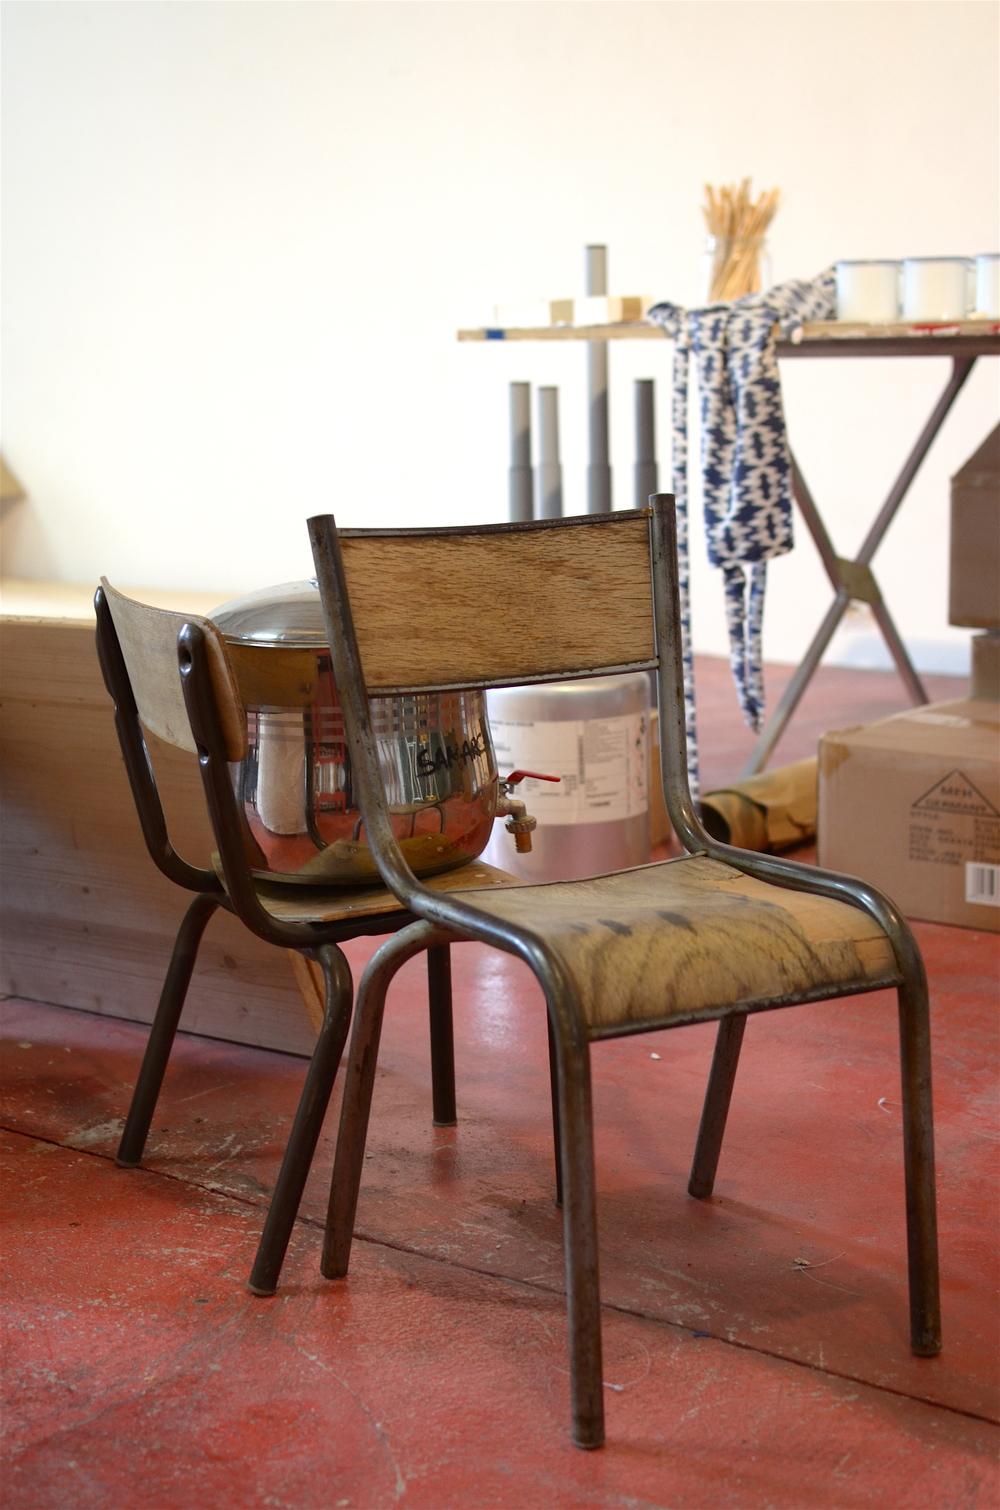 twinky lizzy blog aix en provence - maison maison 08.jpg